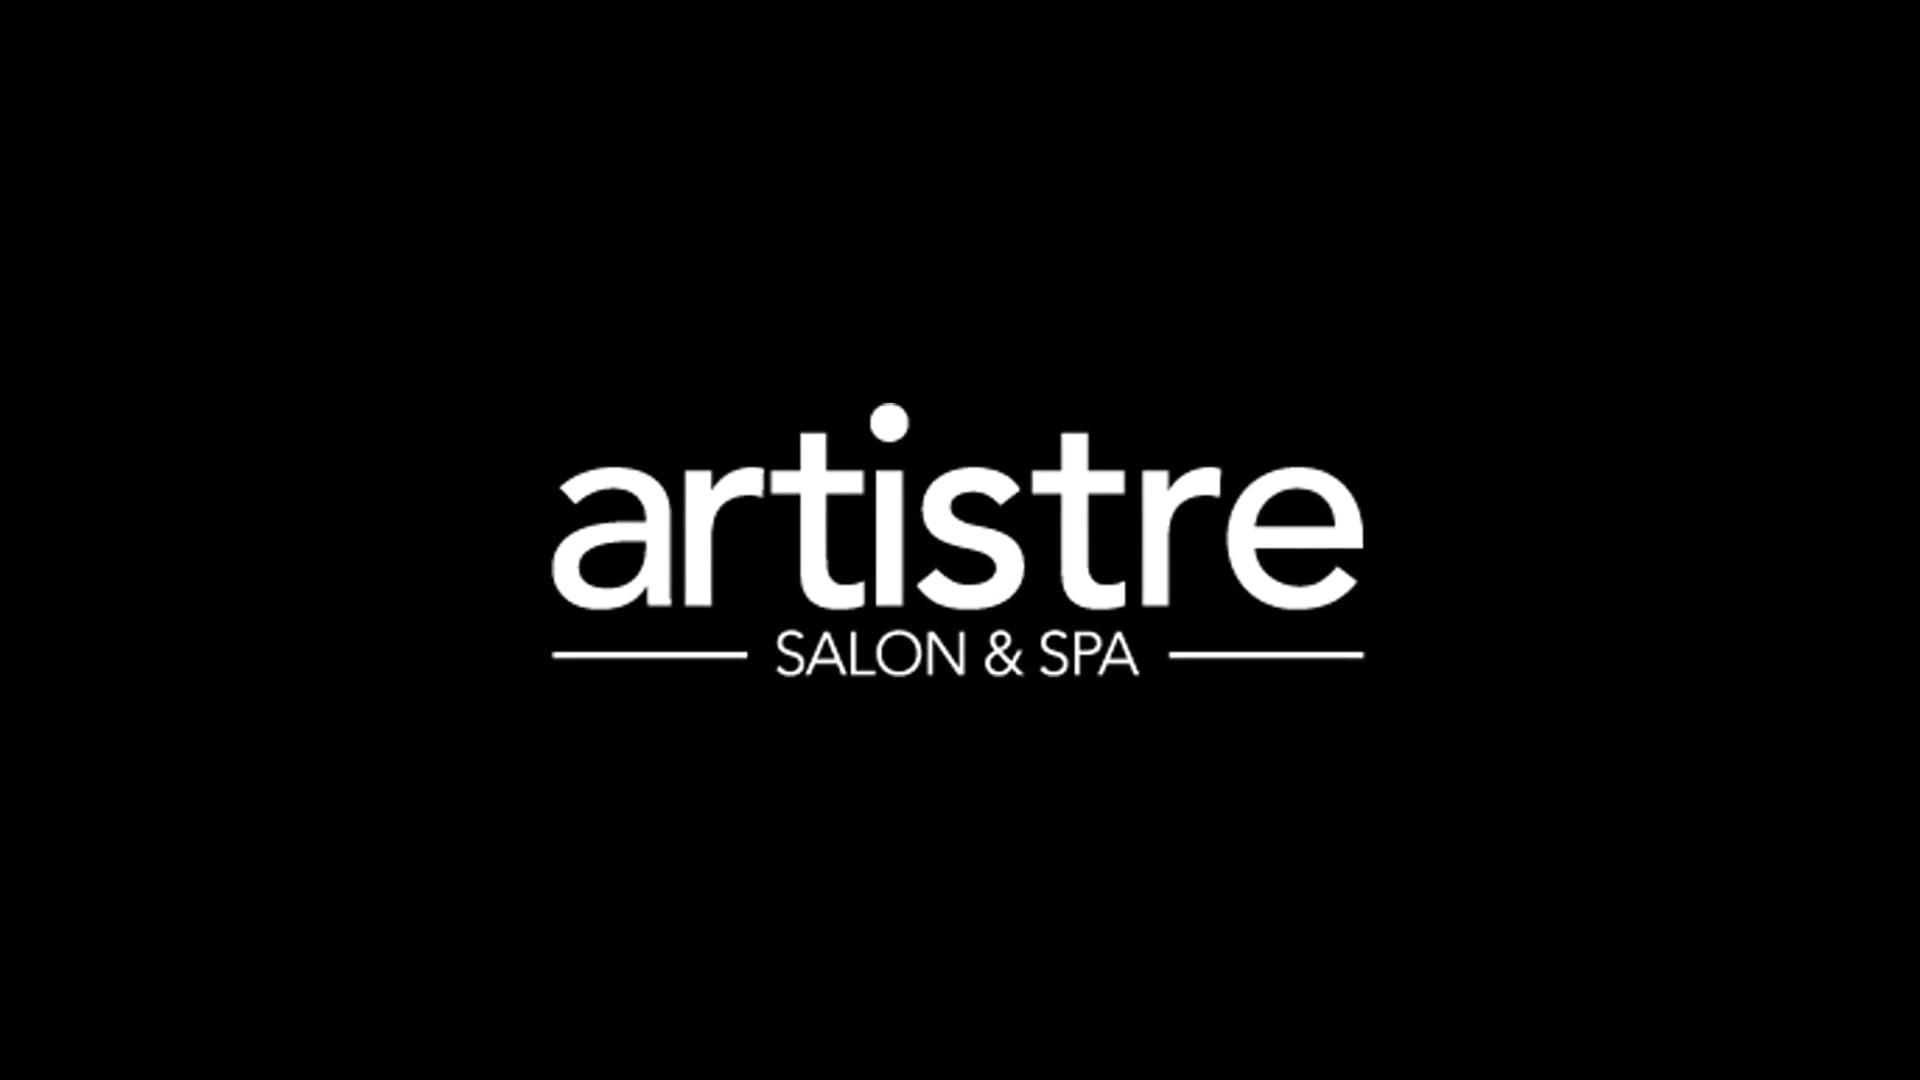 Artistre Salon & Spa